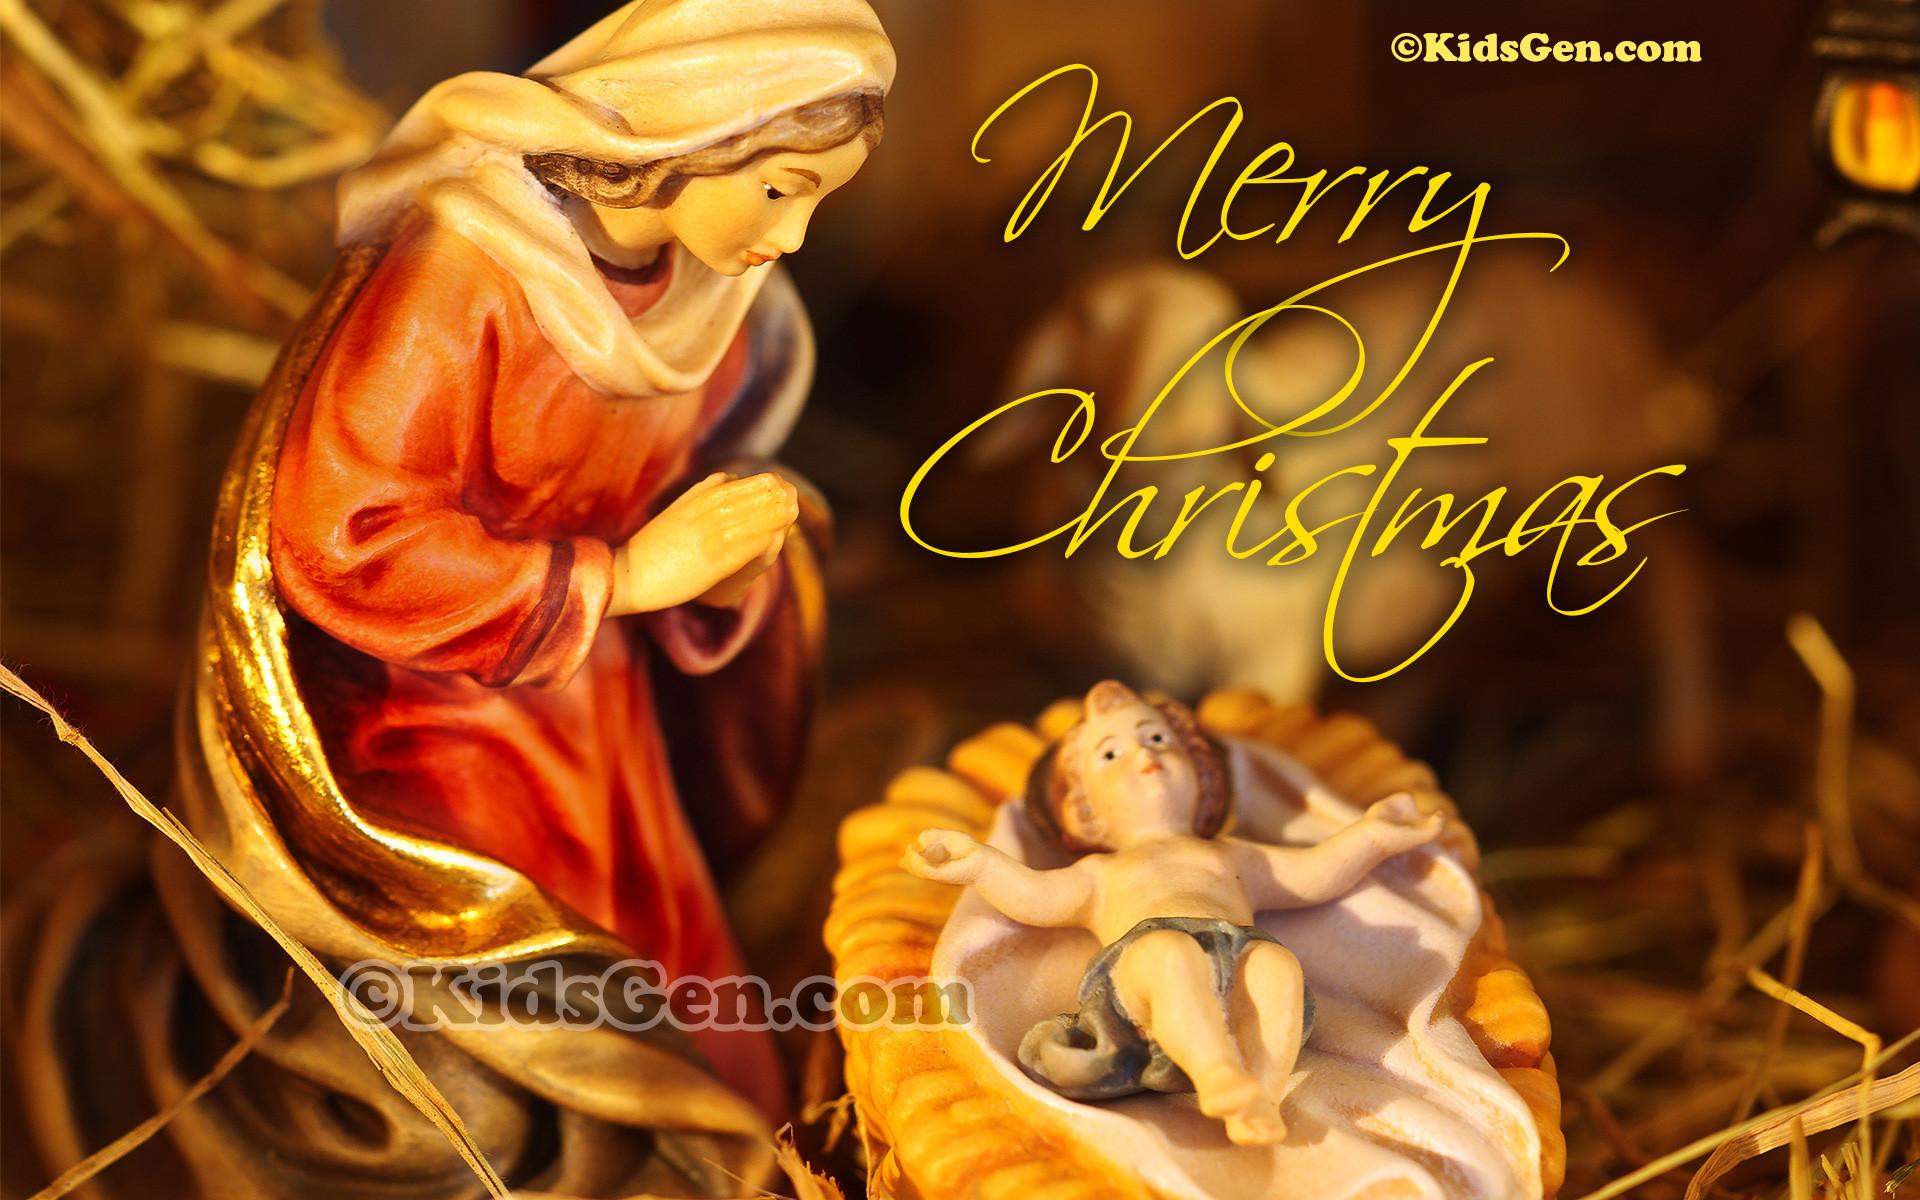 Baby Jesus Merry Christmas Mary and baby jesus!